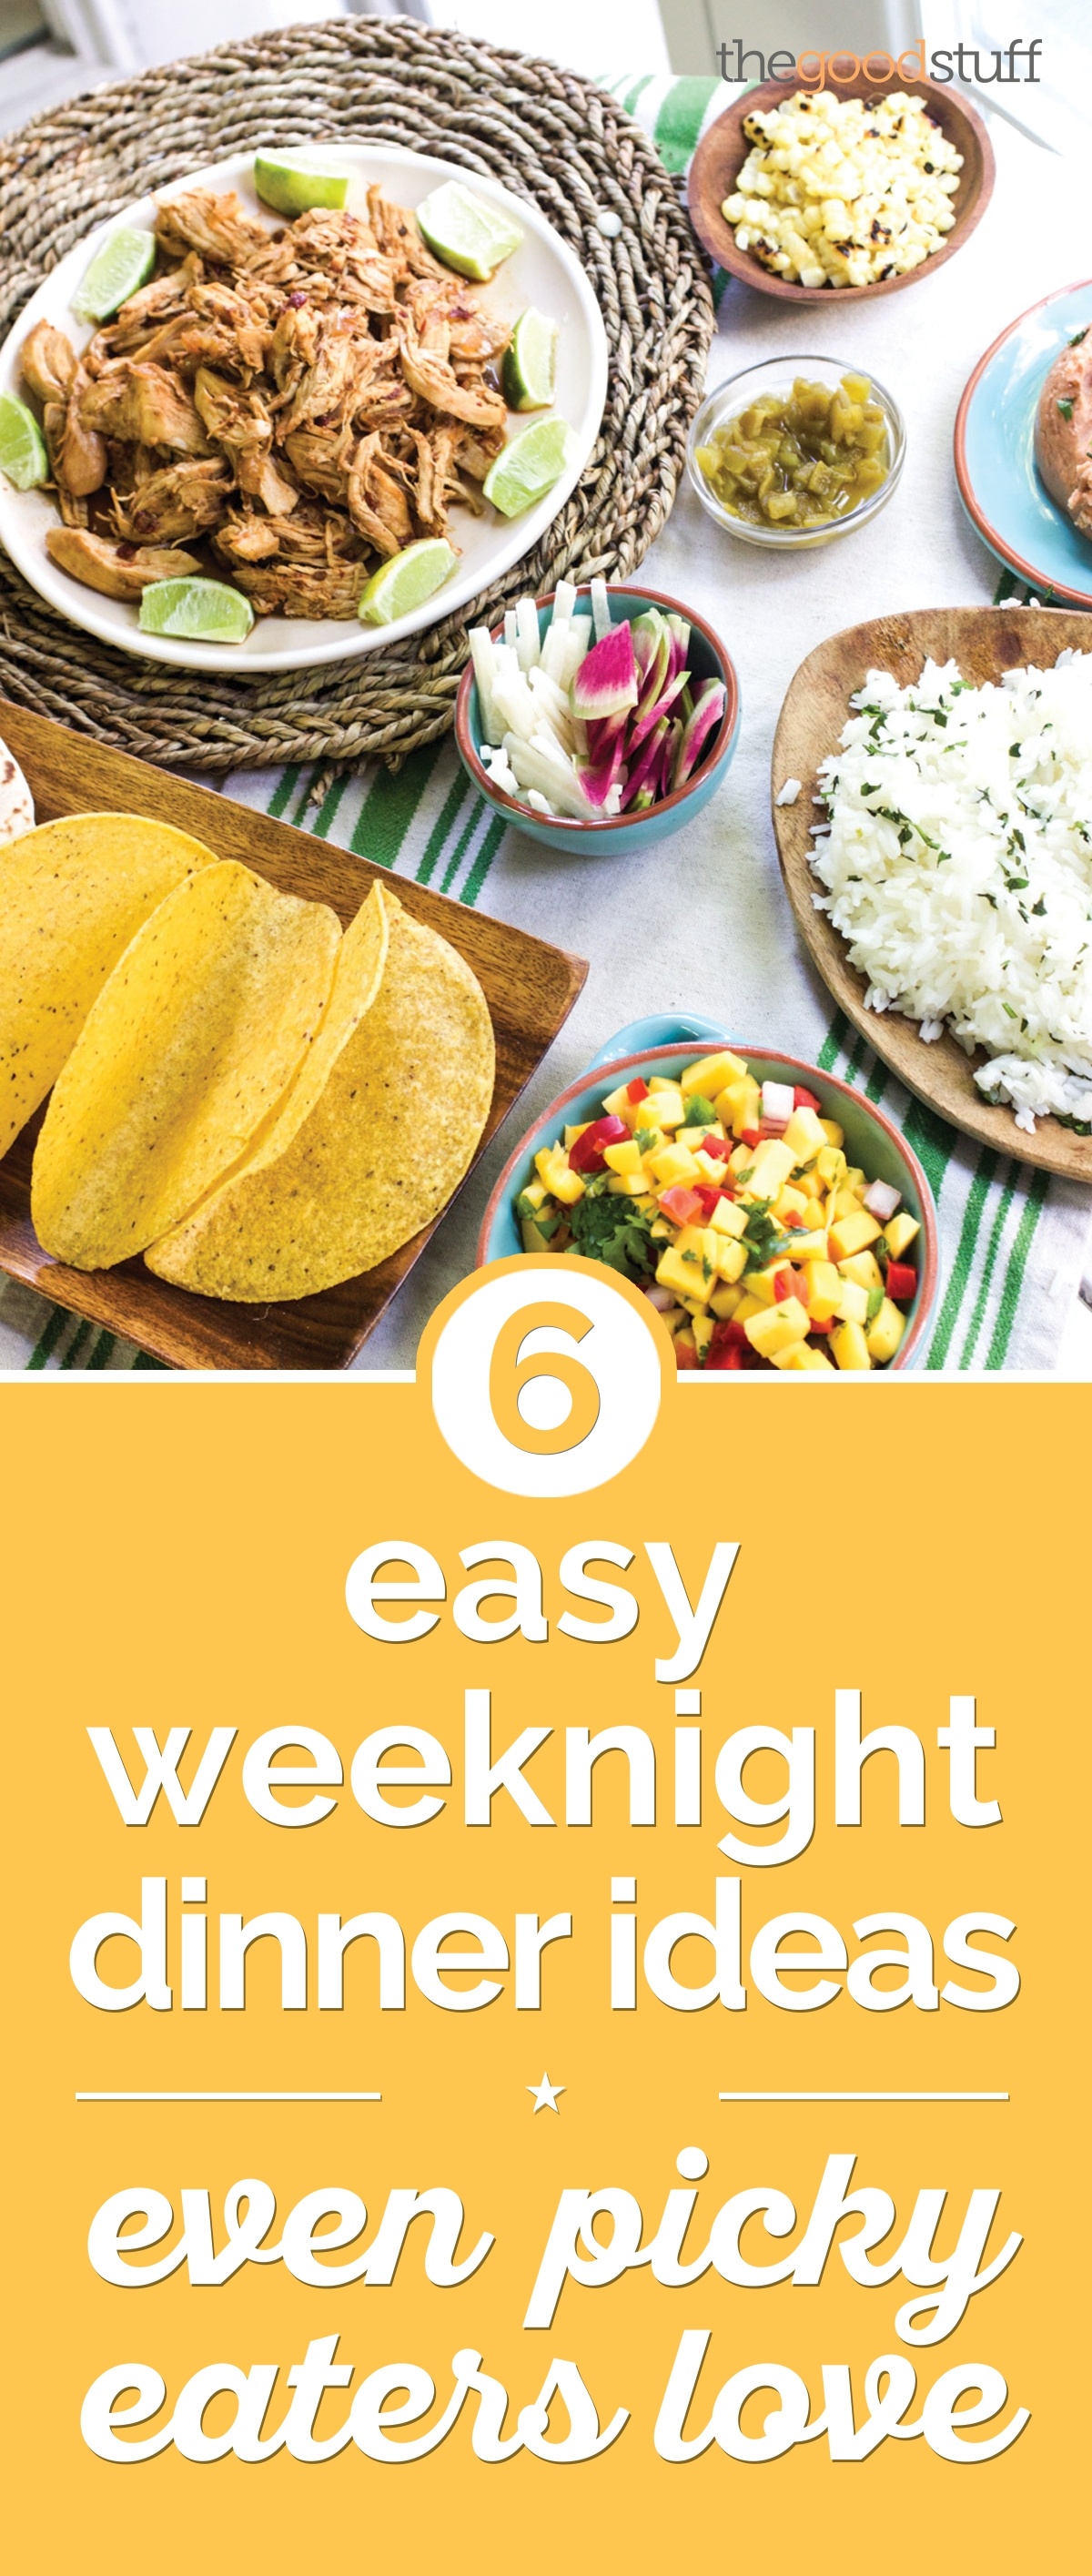 10 Nice Easy Dinner Ideas For 6 6 easy weeknight dinner ideas even picky eaters love thegoodstuff 2 2020